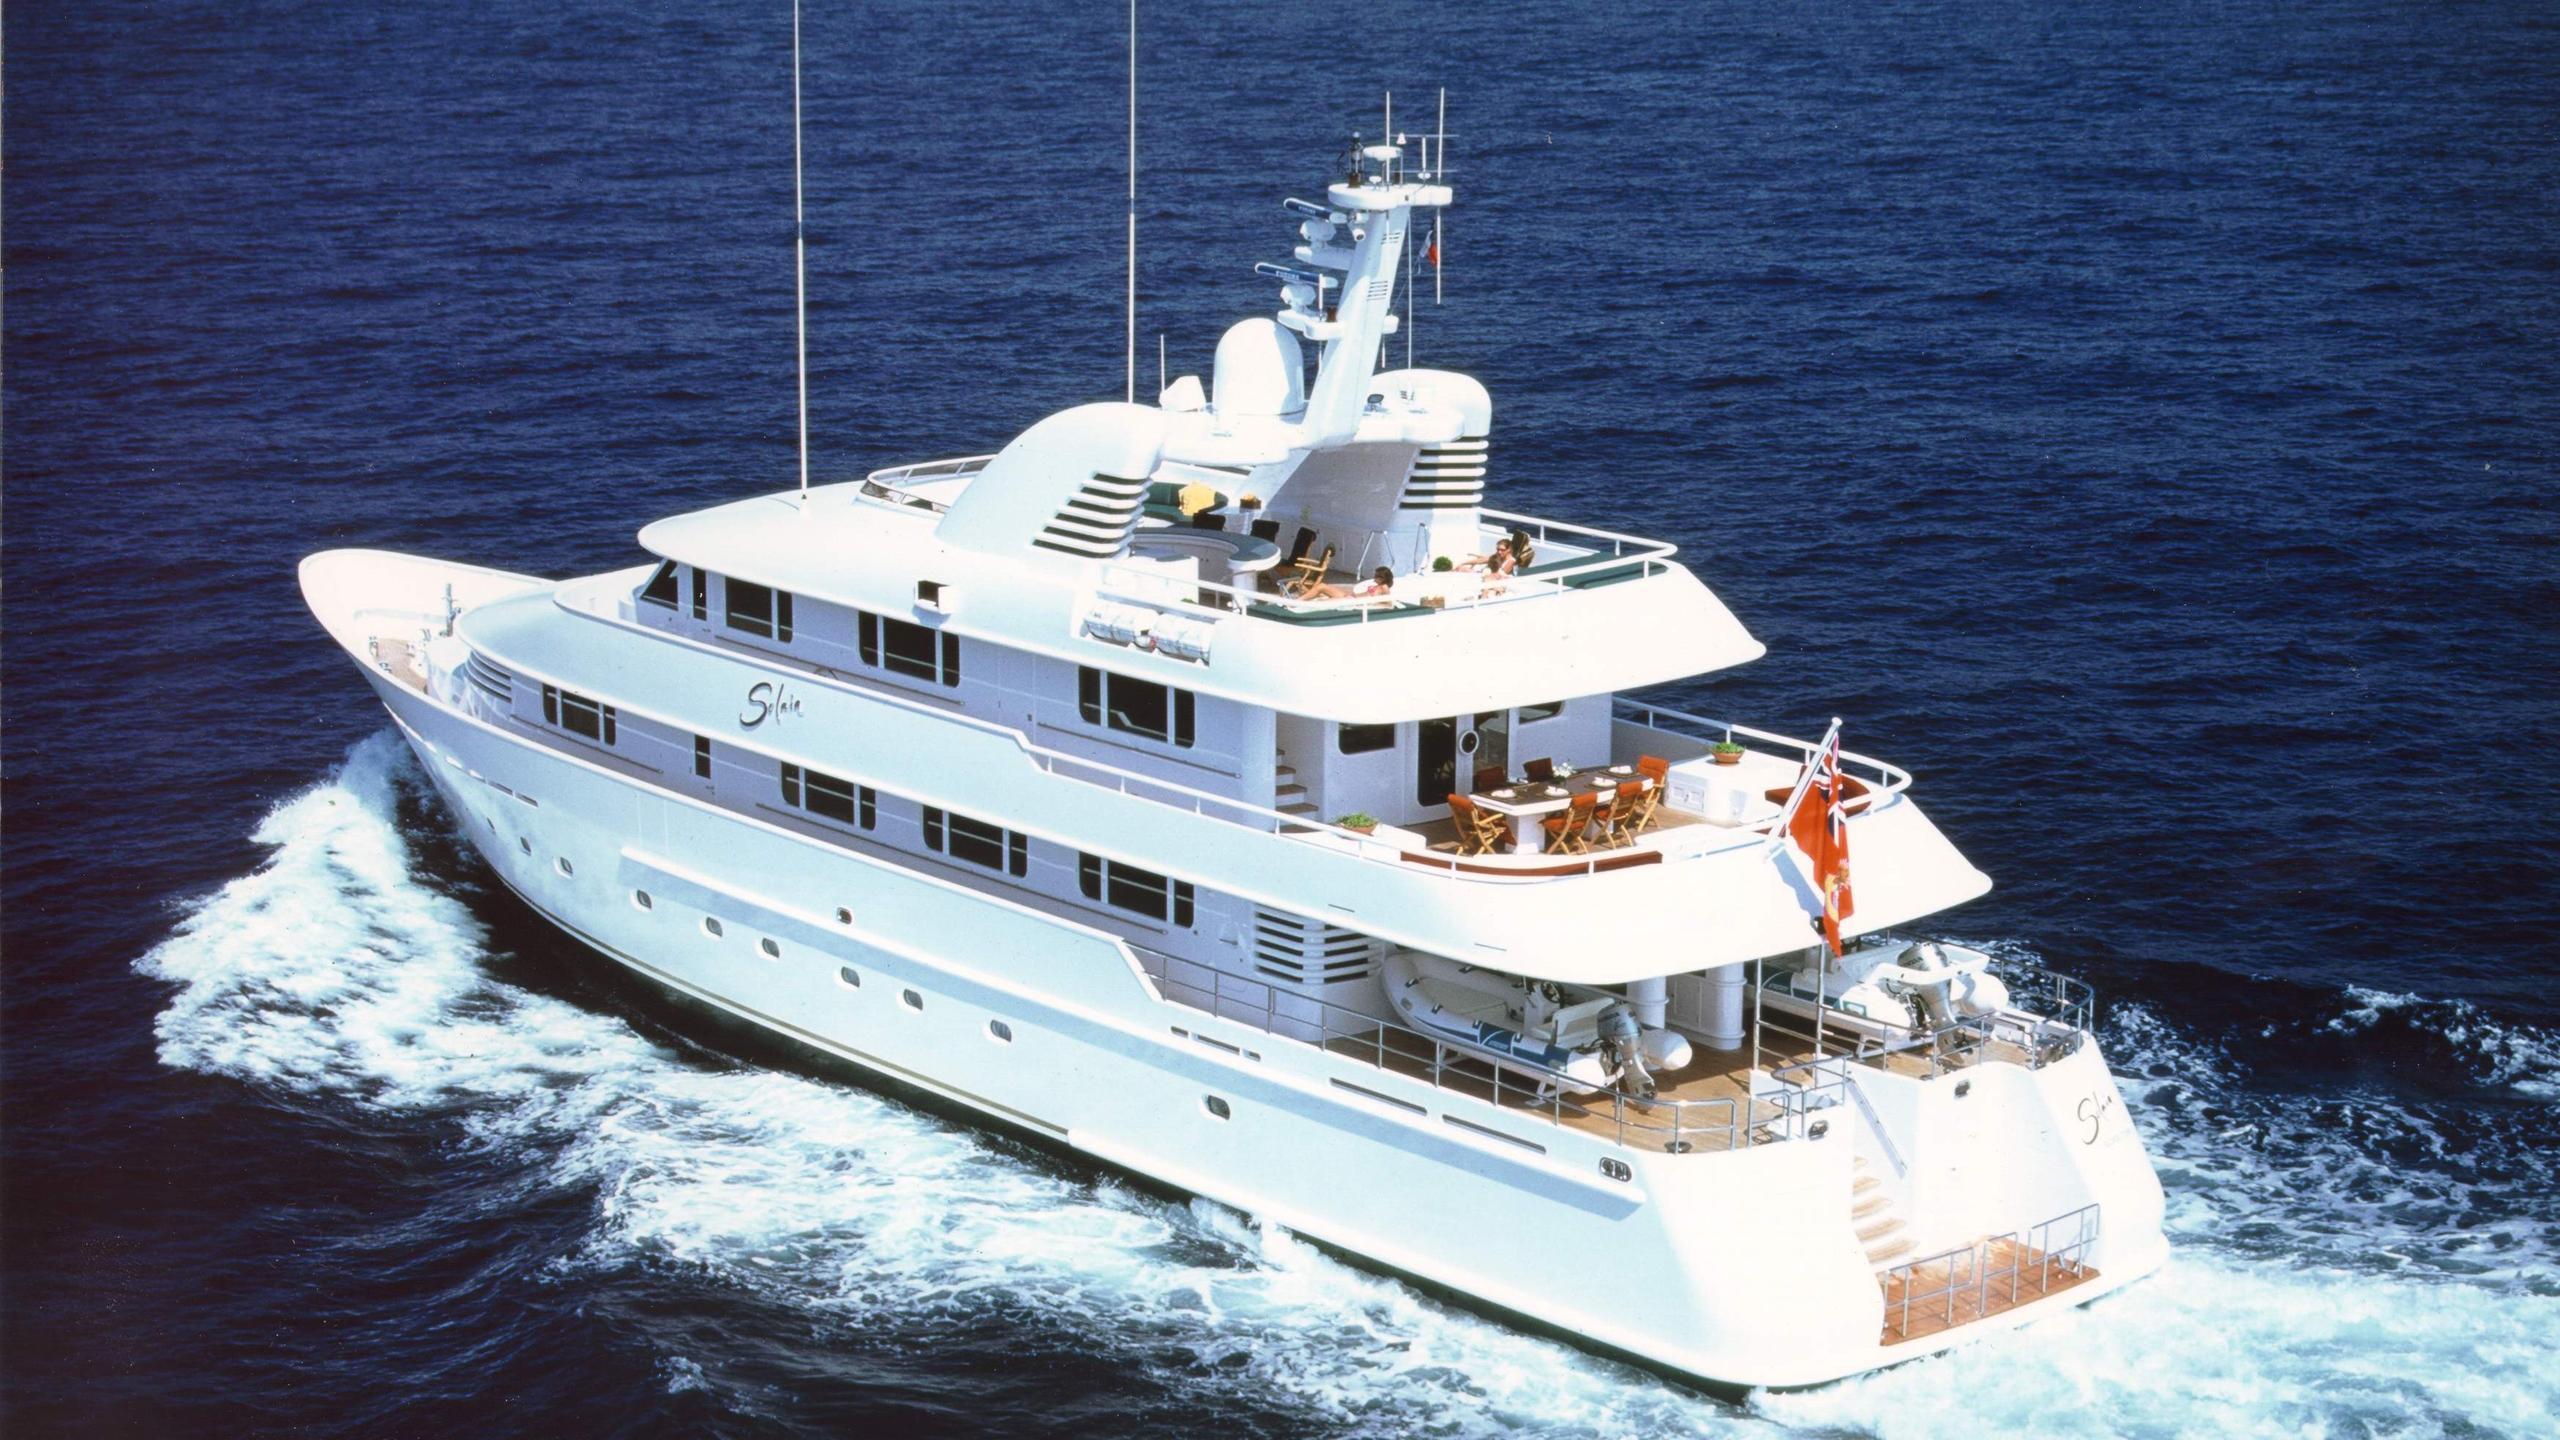 solaia-motor-yacht-hakvoort-2001-40m-cruising